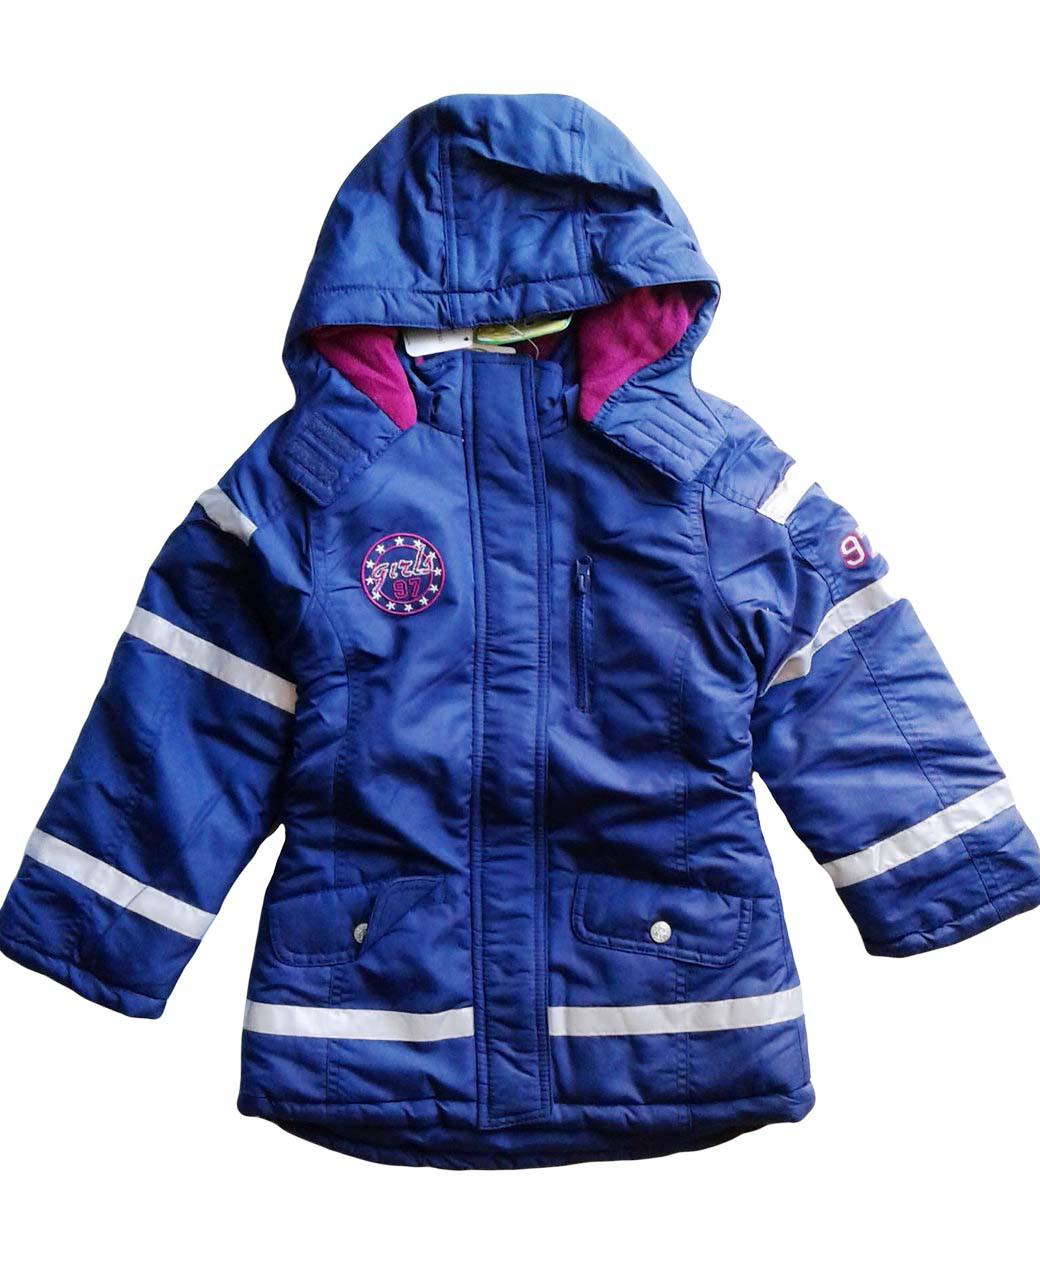 Куртка на флисе для девочки, Pepperts, размеры 122,128,134,140,146 , арт. Л-419, фото 1